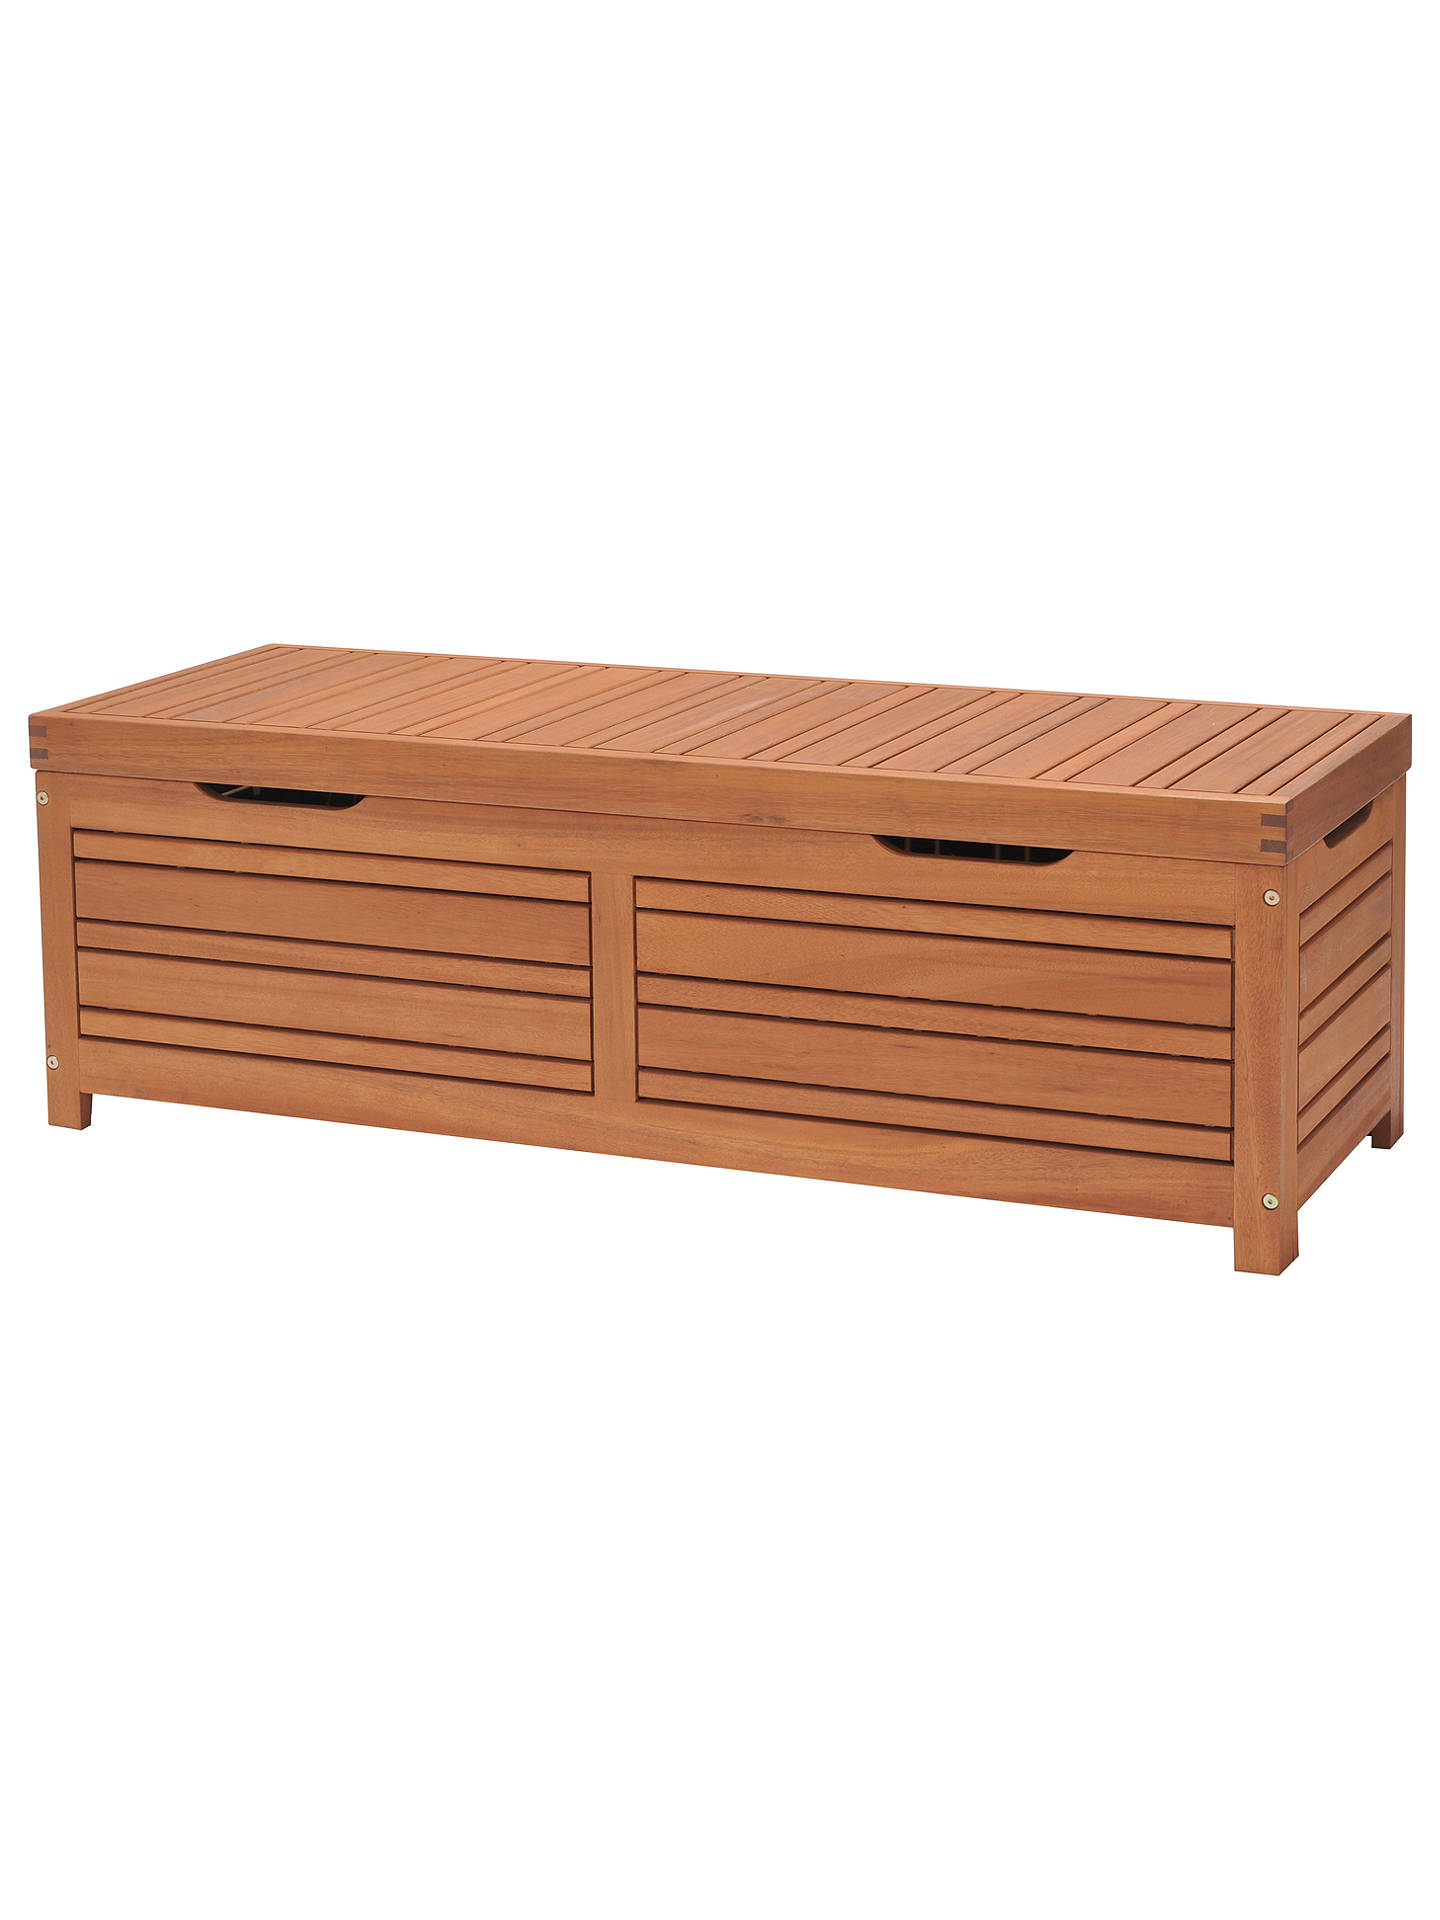 Pleasant John Lewis Partners Venice Storage Box And Bench Fsc Certified Eucalyptus Wood Natural Inzonedesignstudio Interior Chair Design Inzonedesignstudiocom